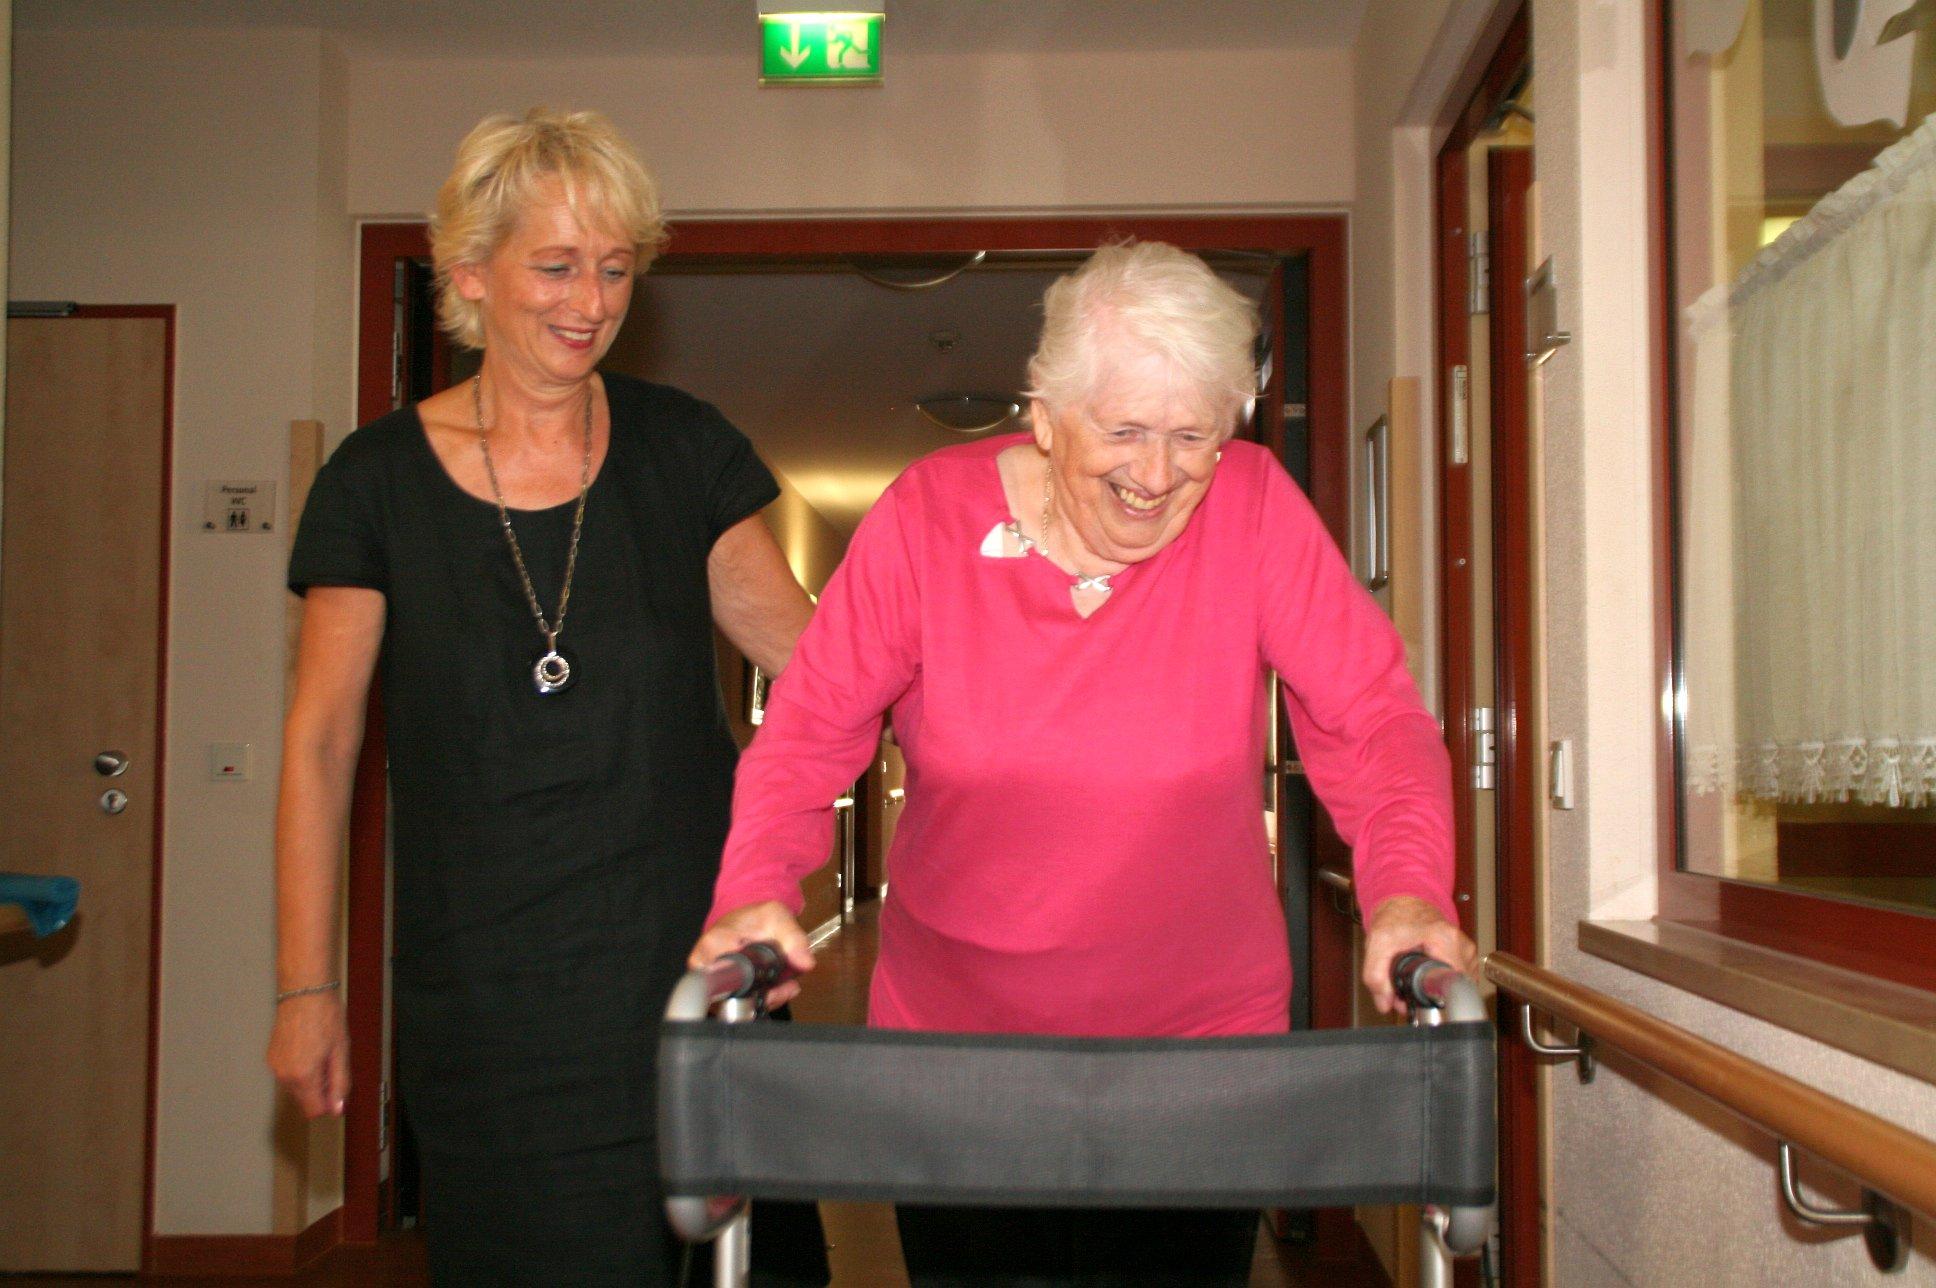 seniorenbetreuung-muenchen-lebensfreude-66-plus-bewegungstraining